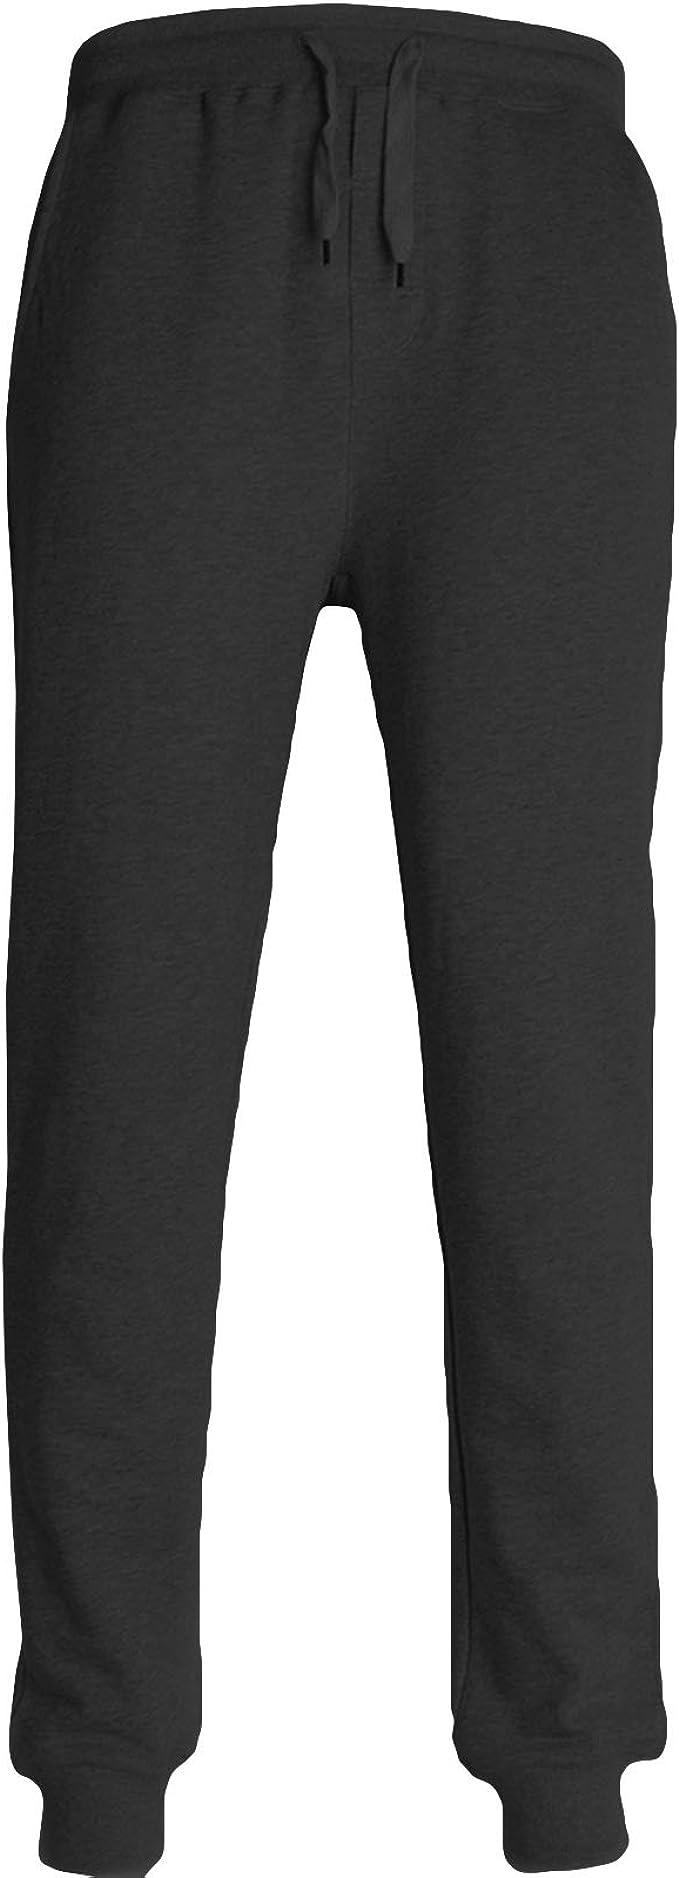 MAOYI/&J6 USA Flag Wrestling-2 Long Sweatpants Juniors Boys Girls Jogger Pants with Drawstring